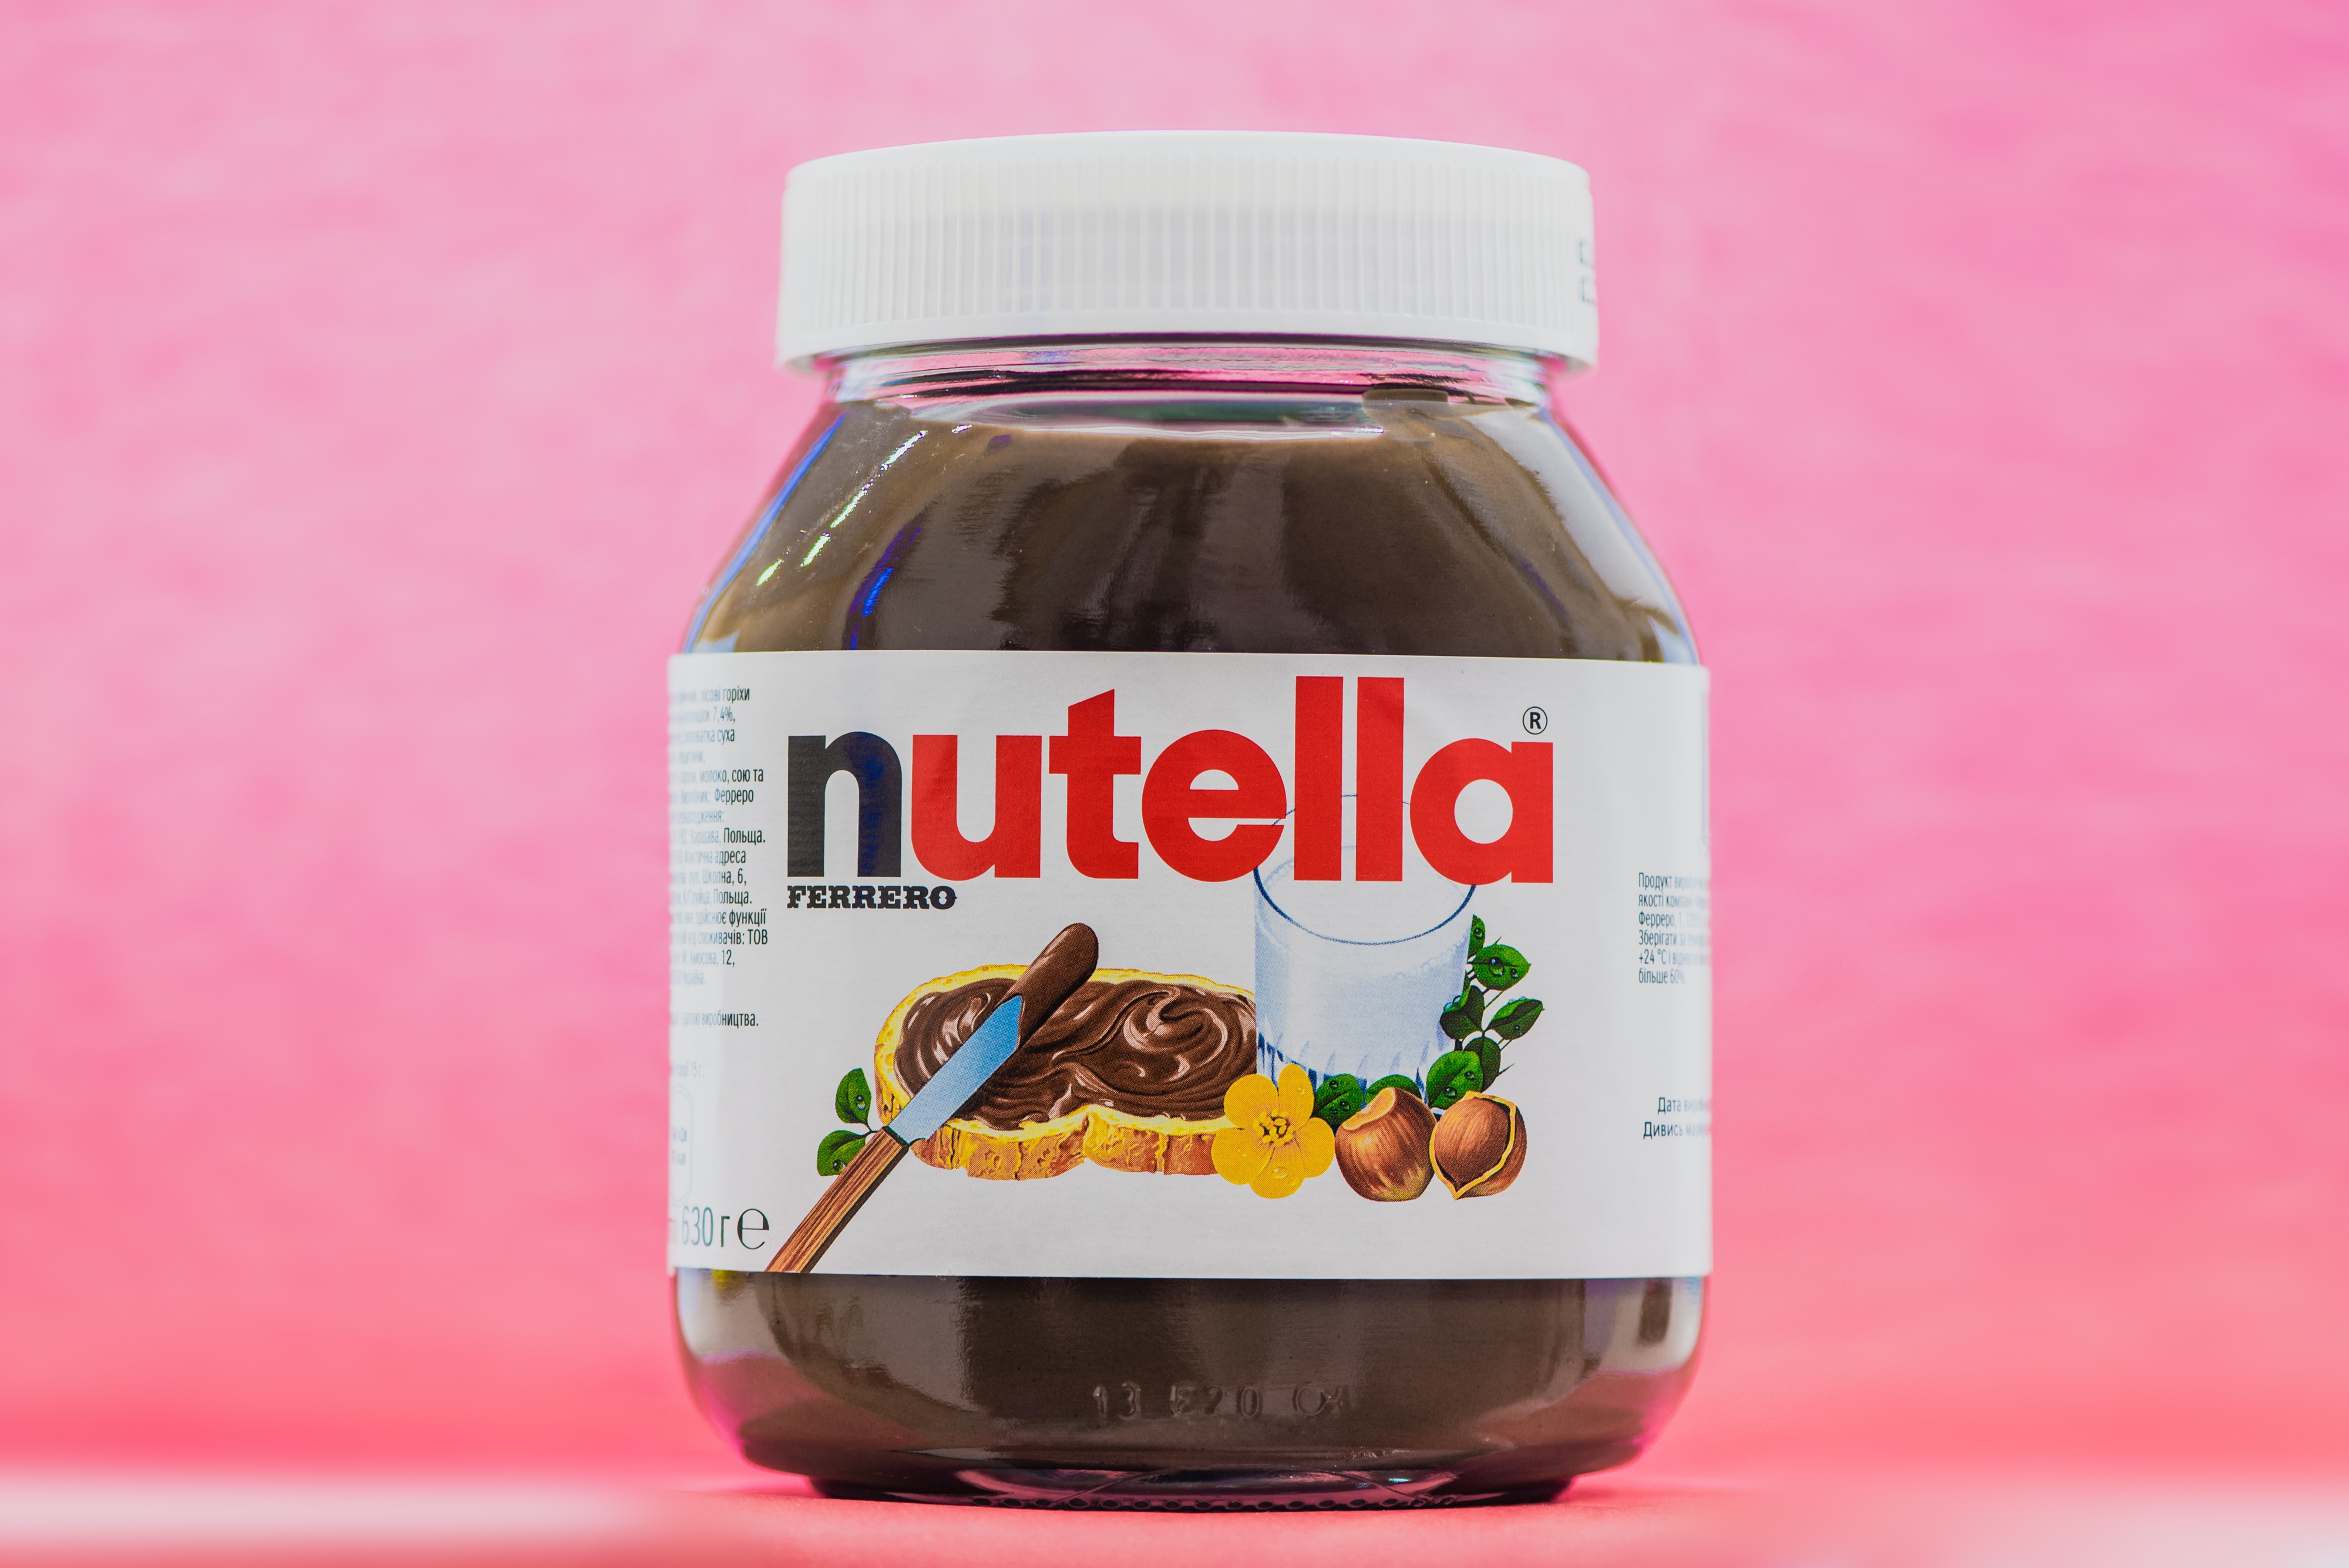 8 verrassende feitjes over Nutella